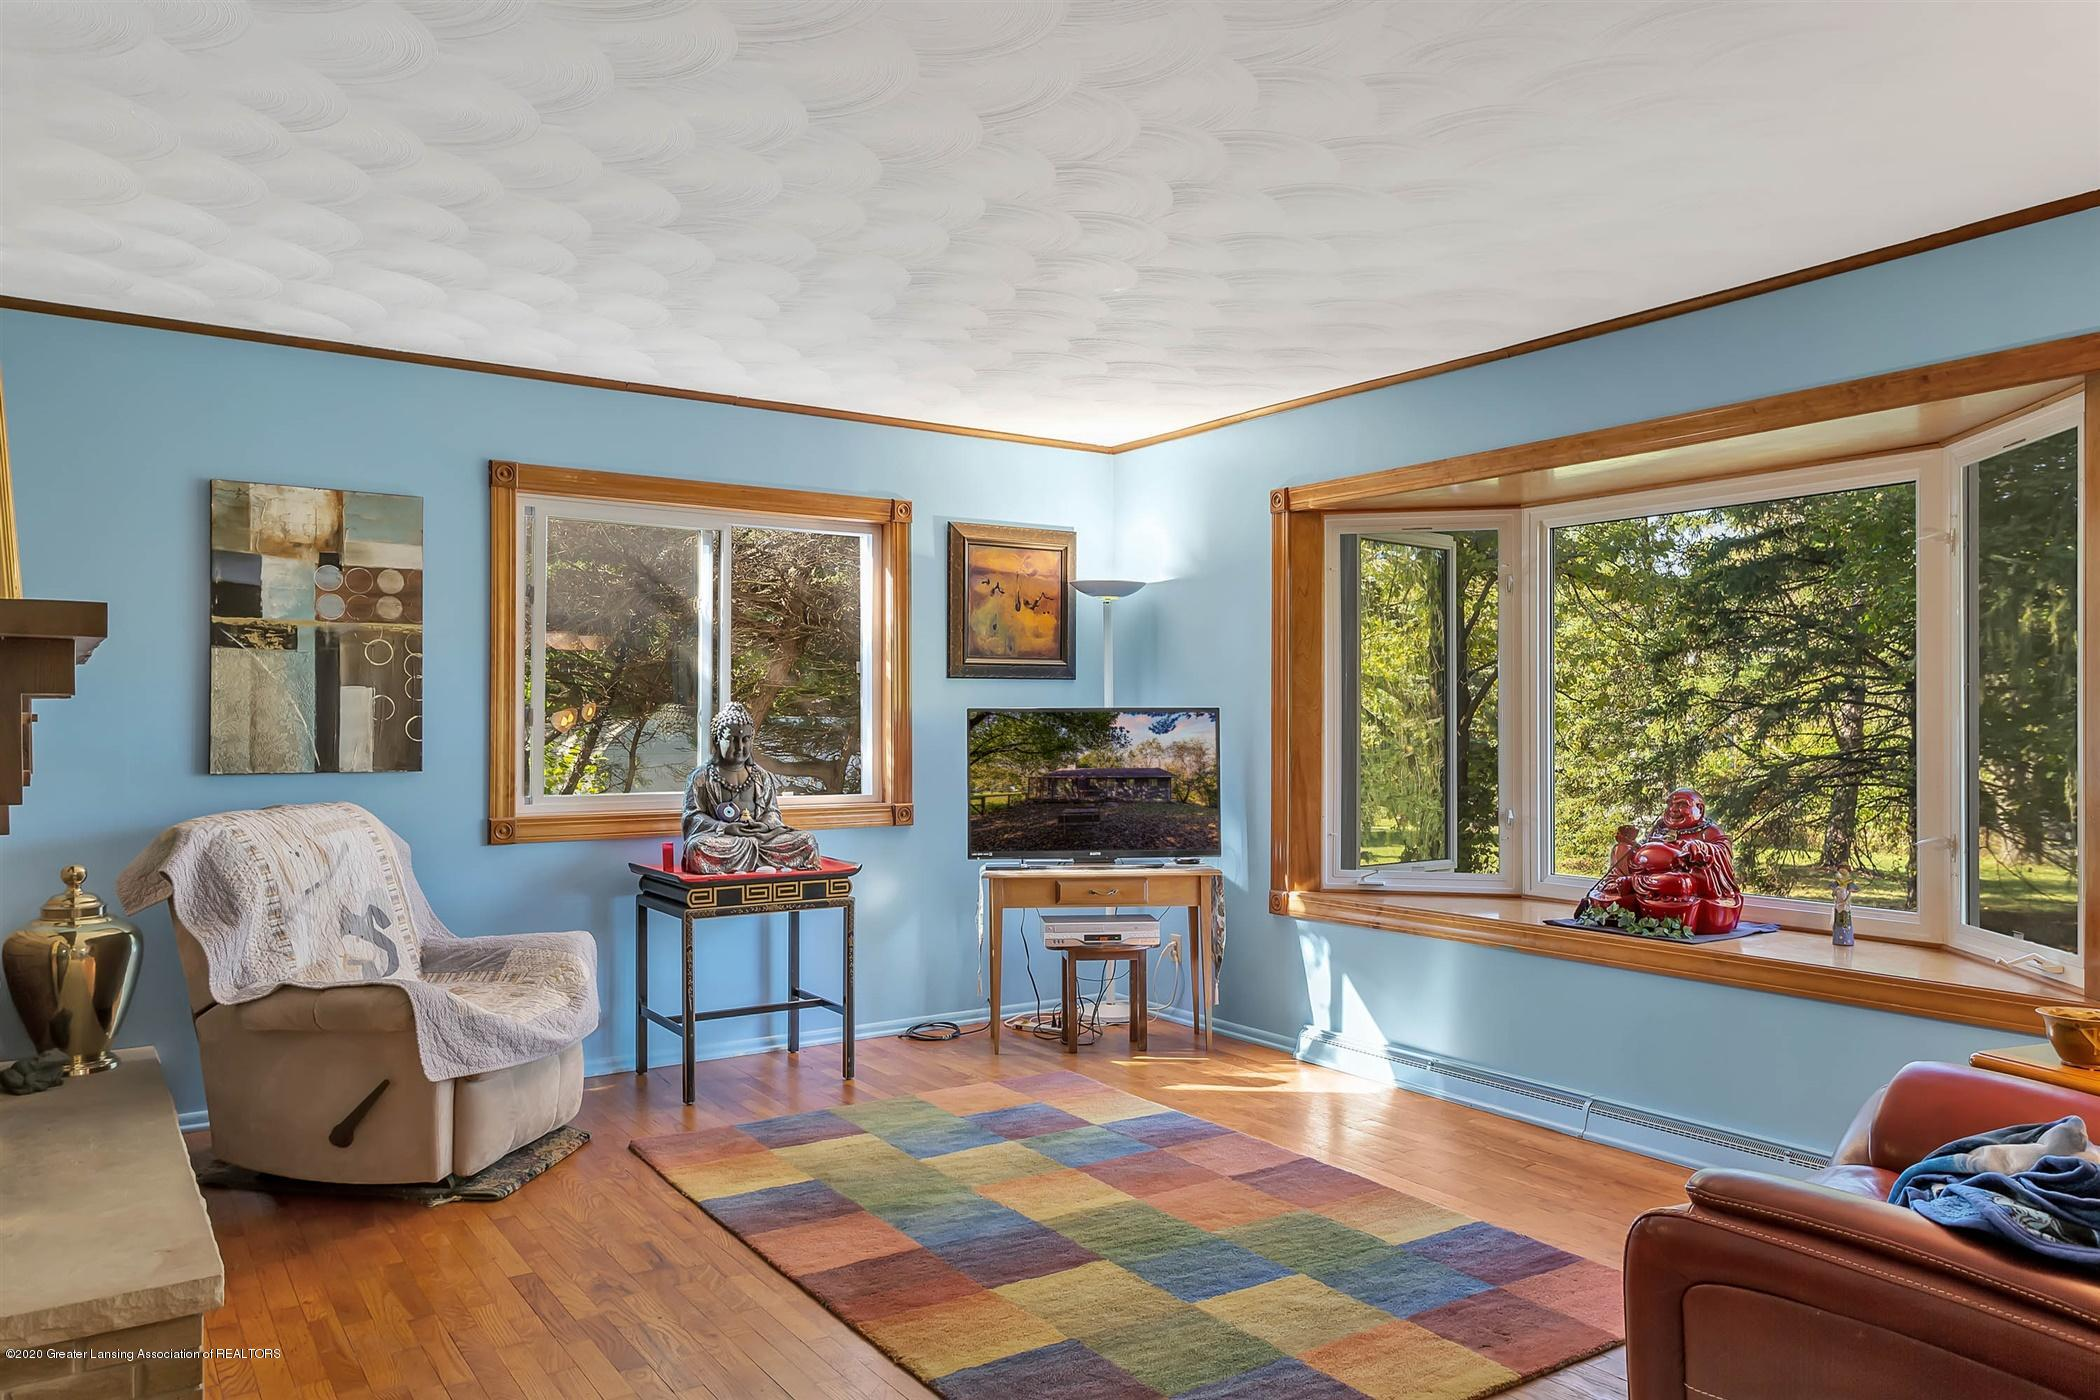 5110 E Clark Rd - 09-5110 Clark Rd-WindowStill-Real-E - 9